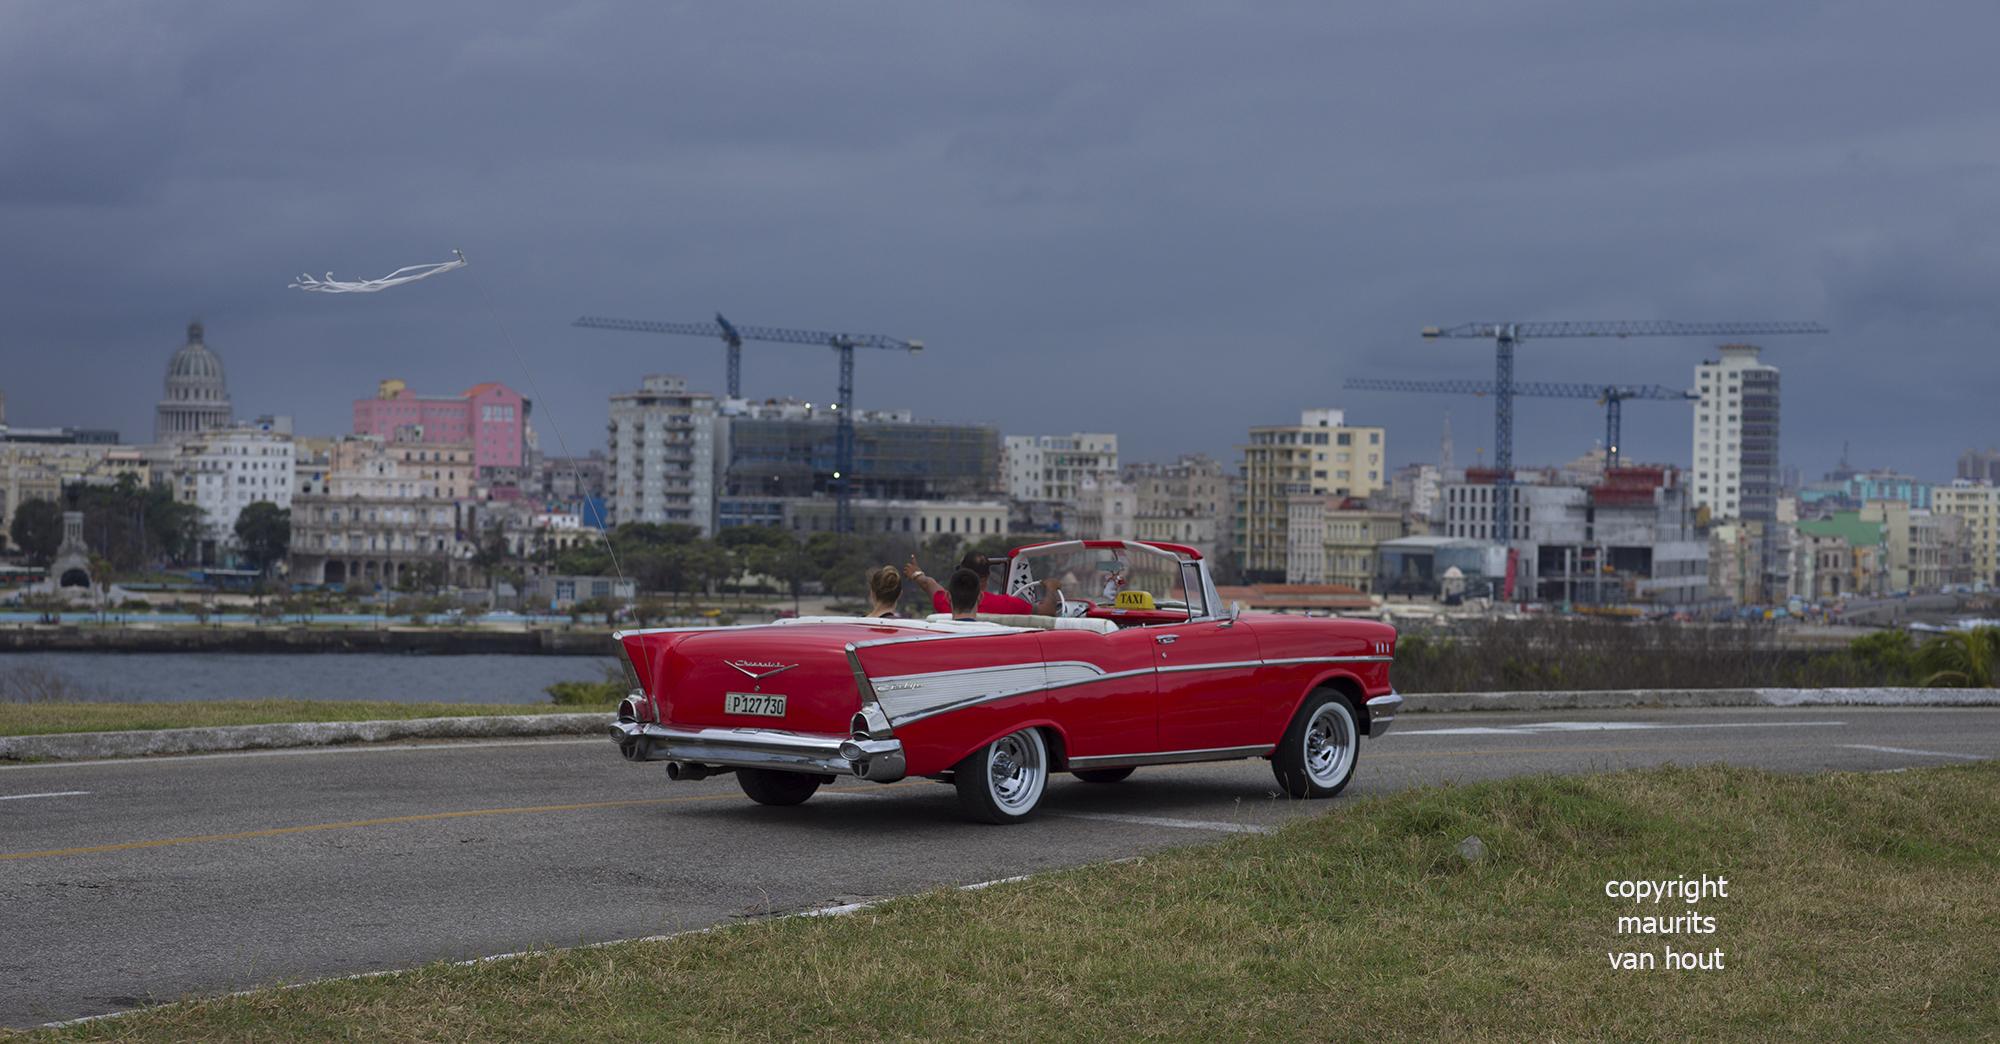 Cuba, Havana skyline by Dutch photographer Maurits van Hout